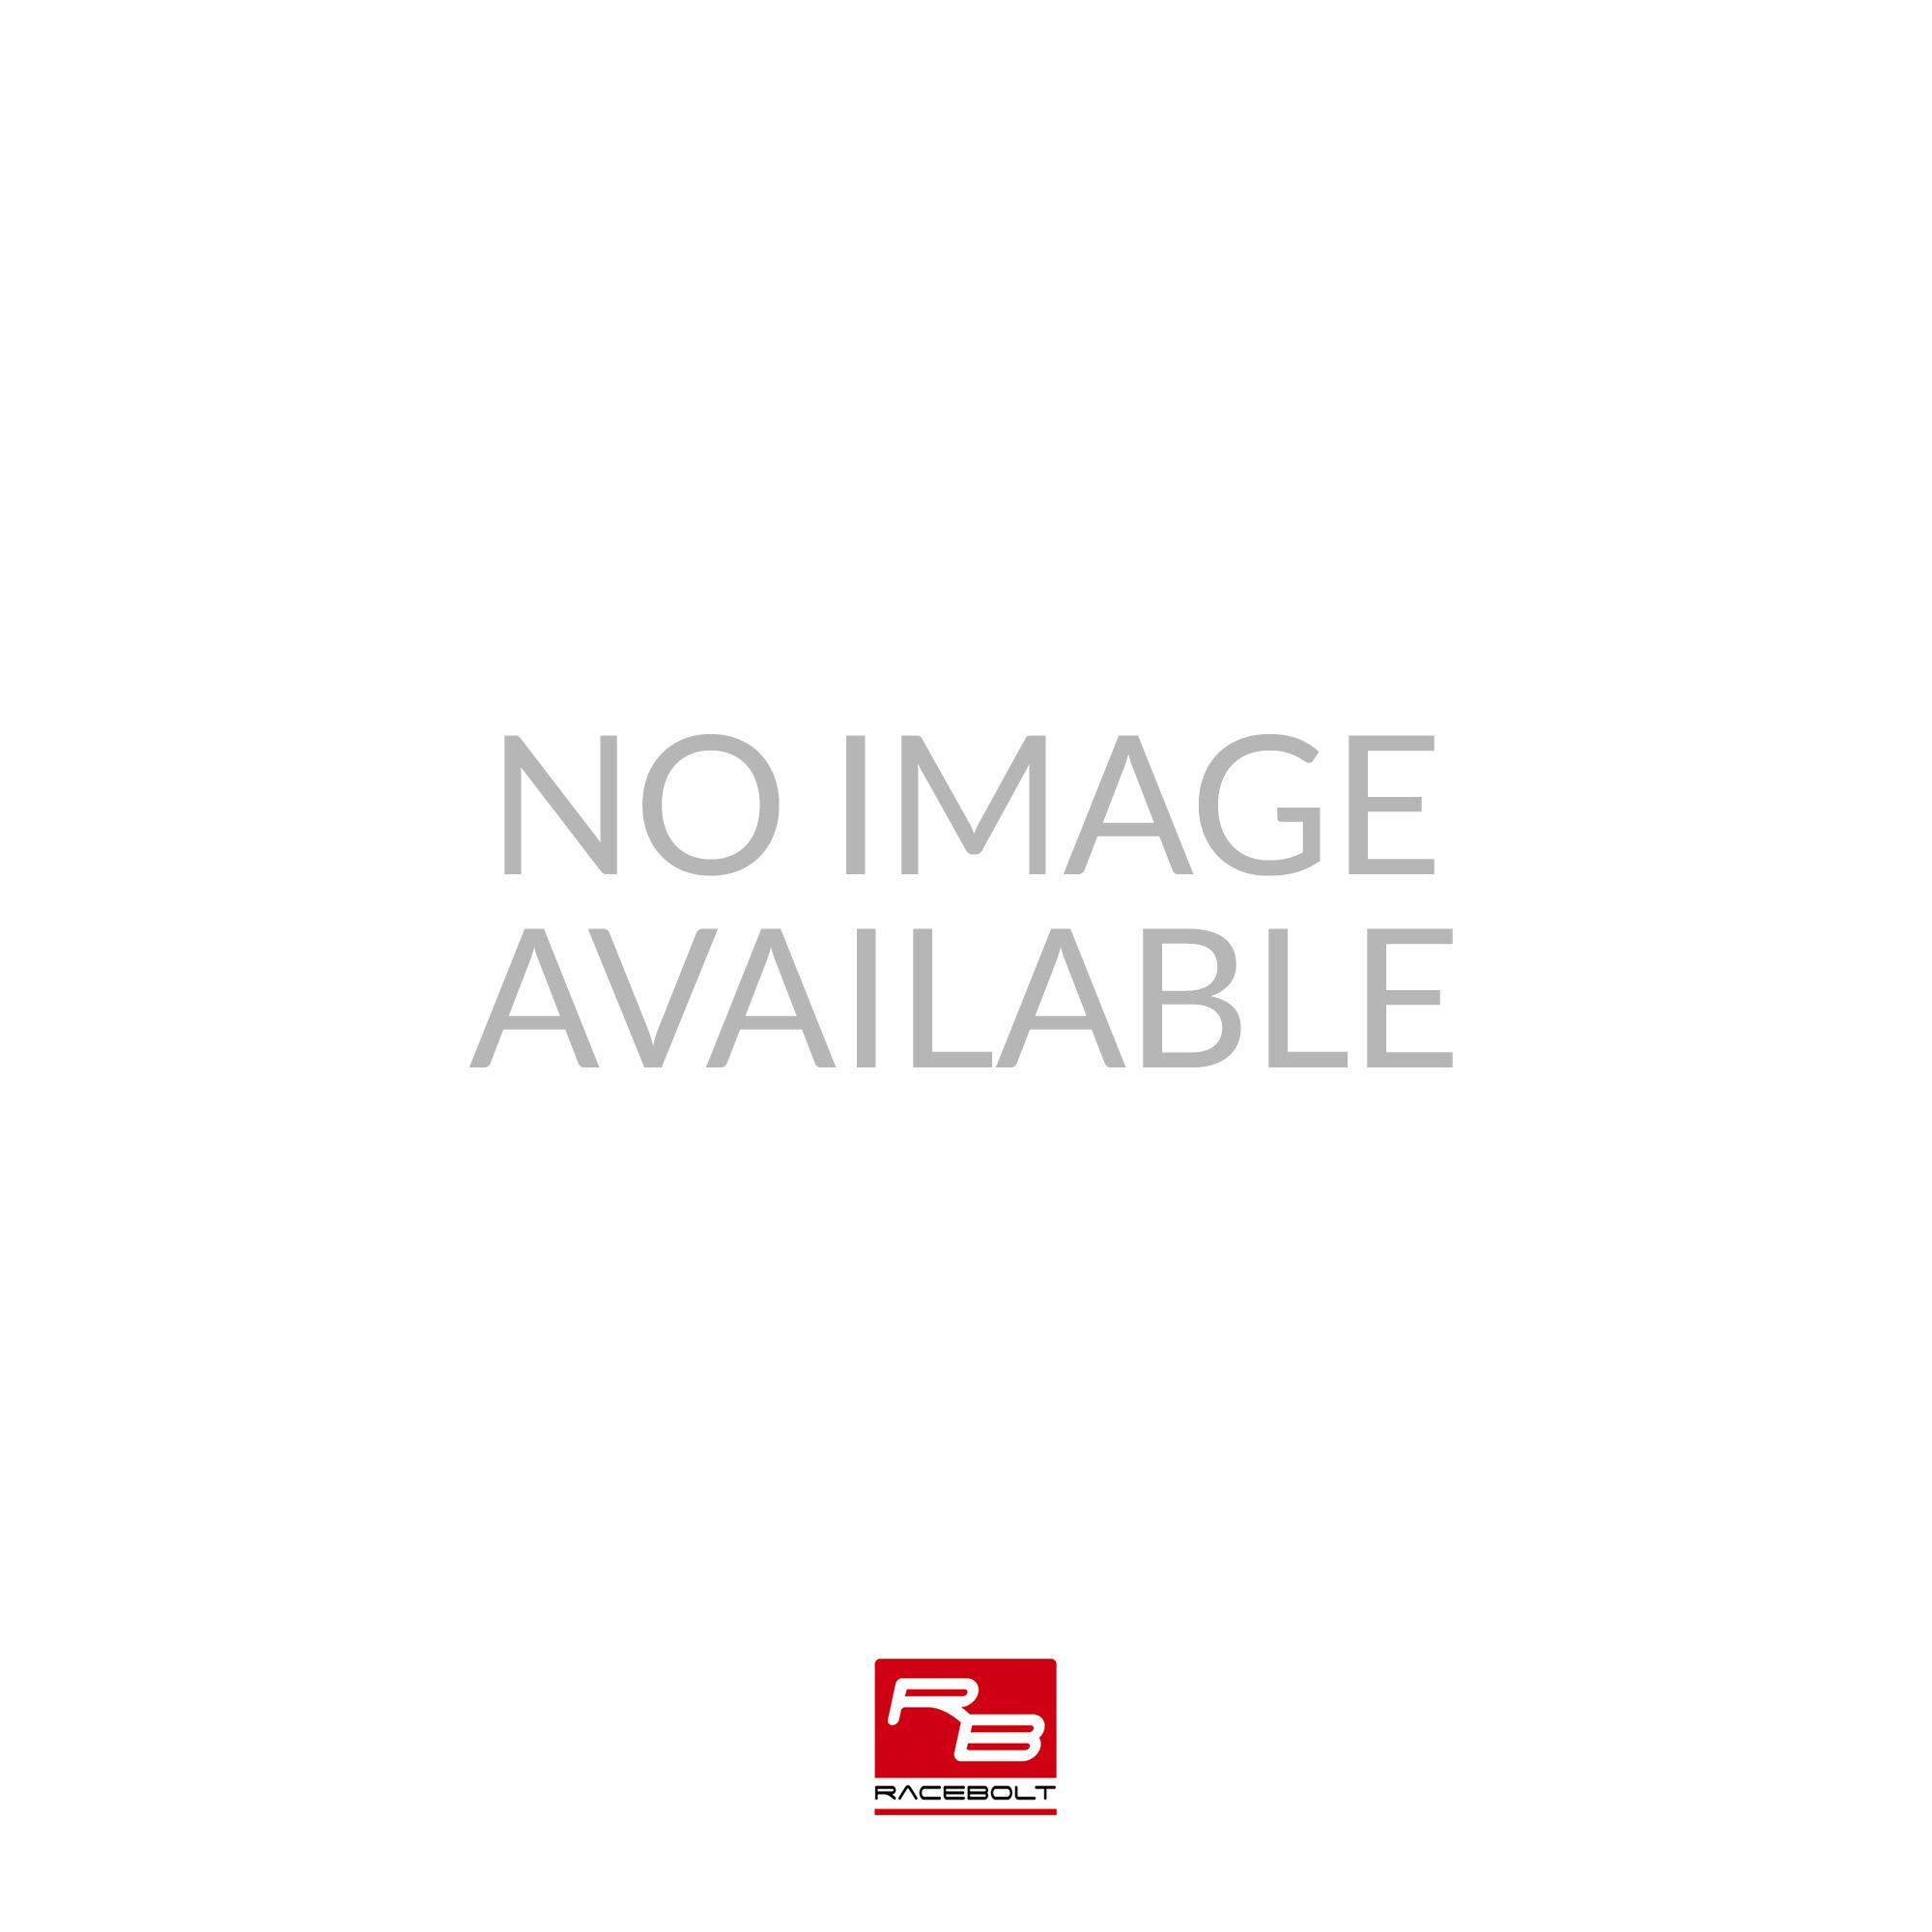 Suzuki GSX-R750 08-10 Stainless Steel Rear Caliper Pad Pin